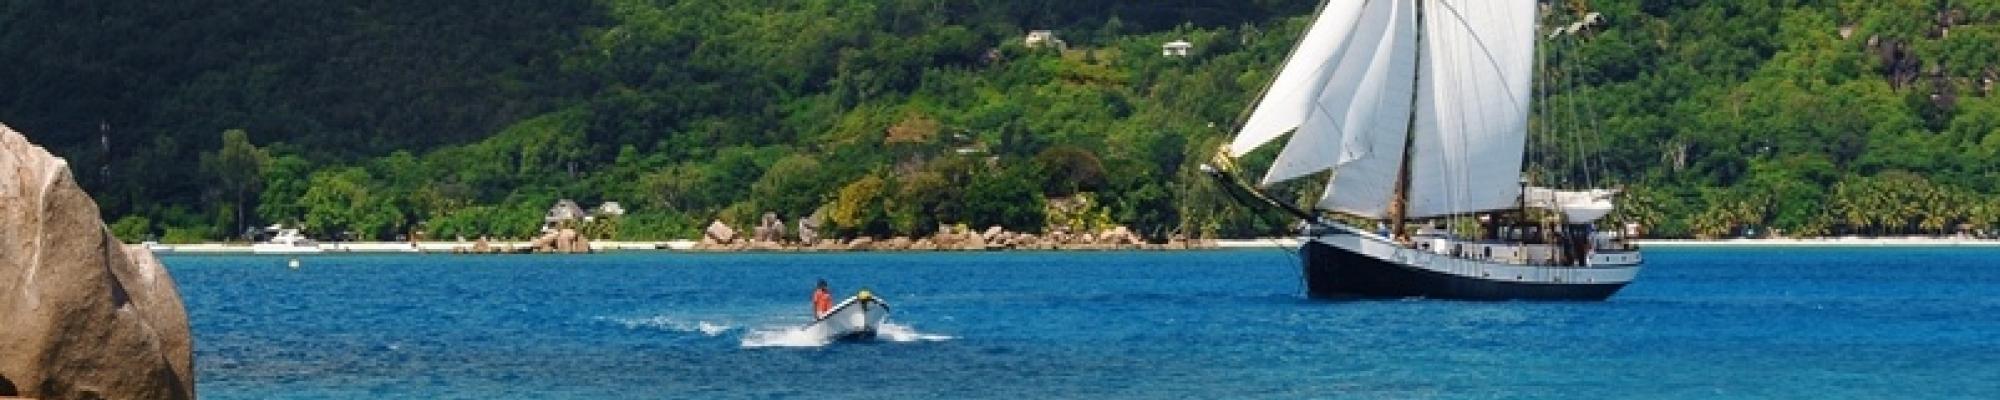 Voyage Seychelles sur mesure